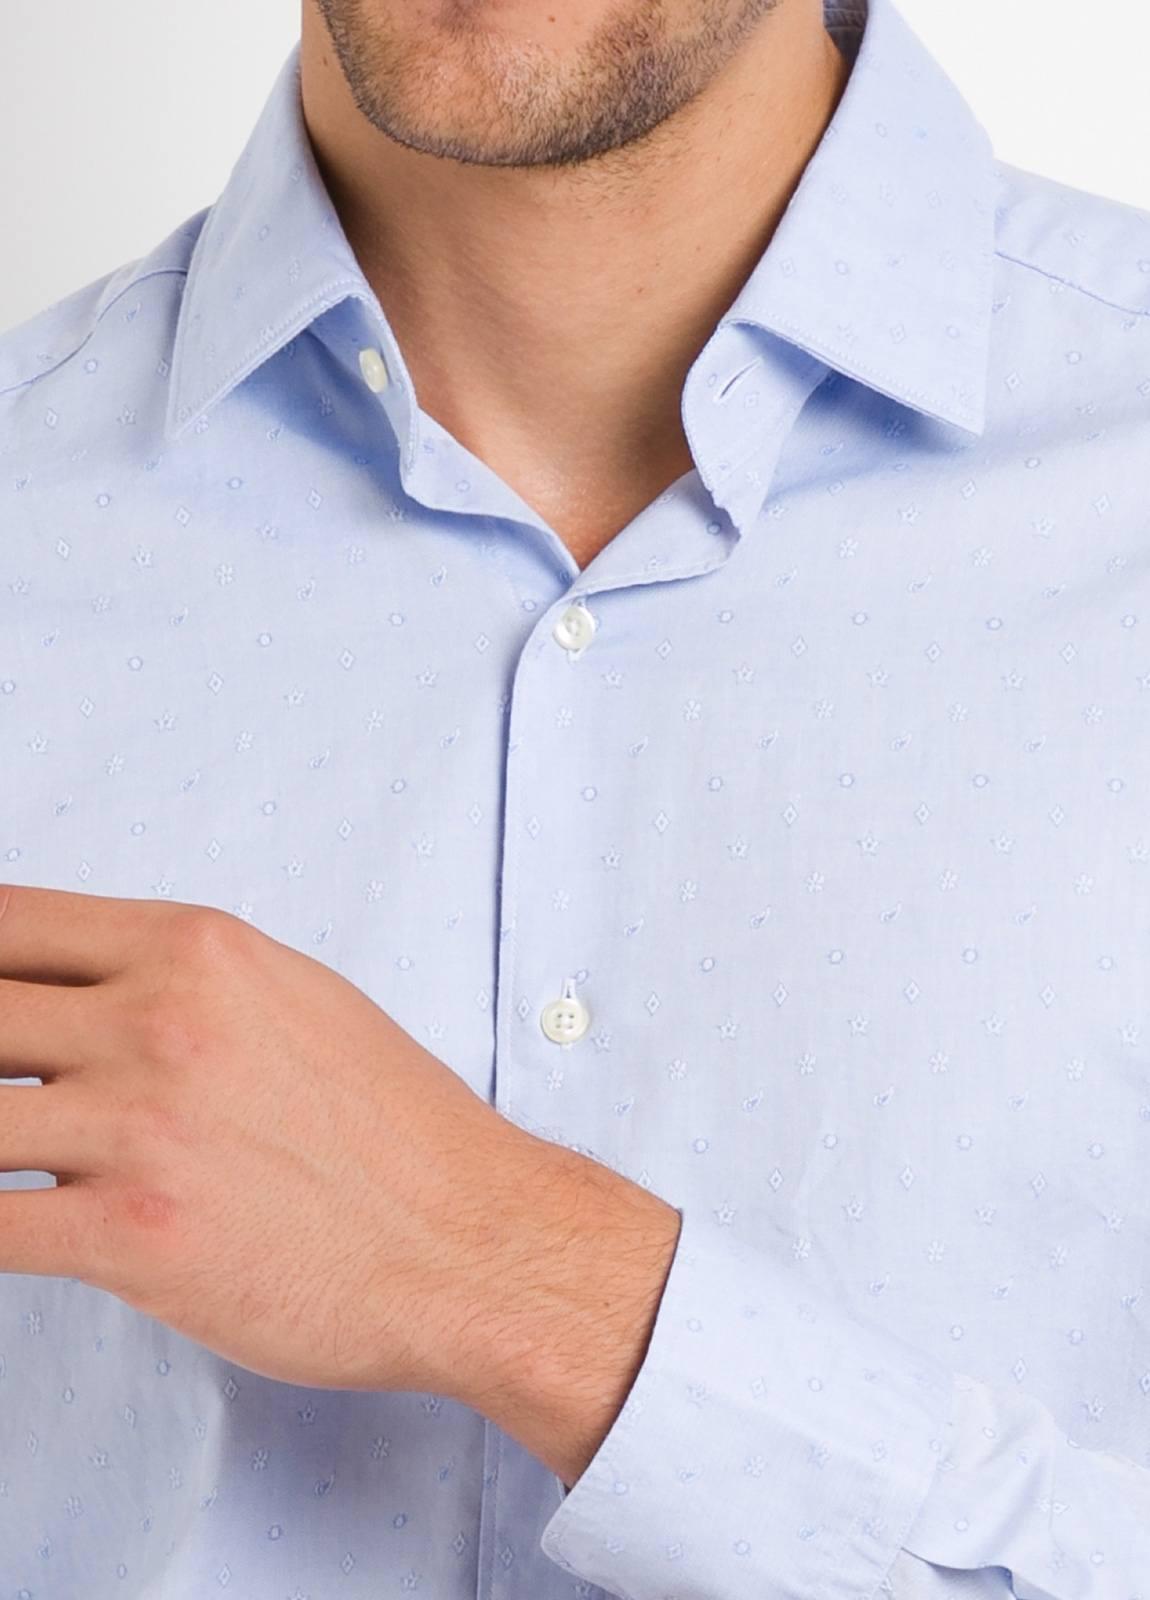 Camisa Leisure Wear REGULAR FIT modelo PORTO tejido dibujo jacquard color celeste. 100% Algodón. - Ítem3